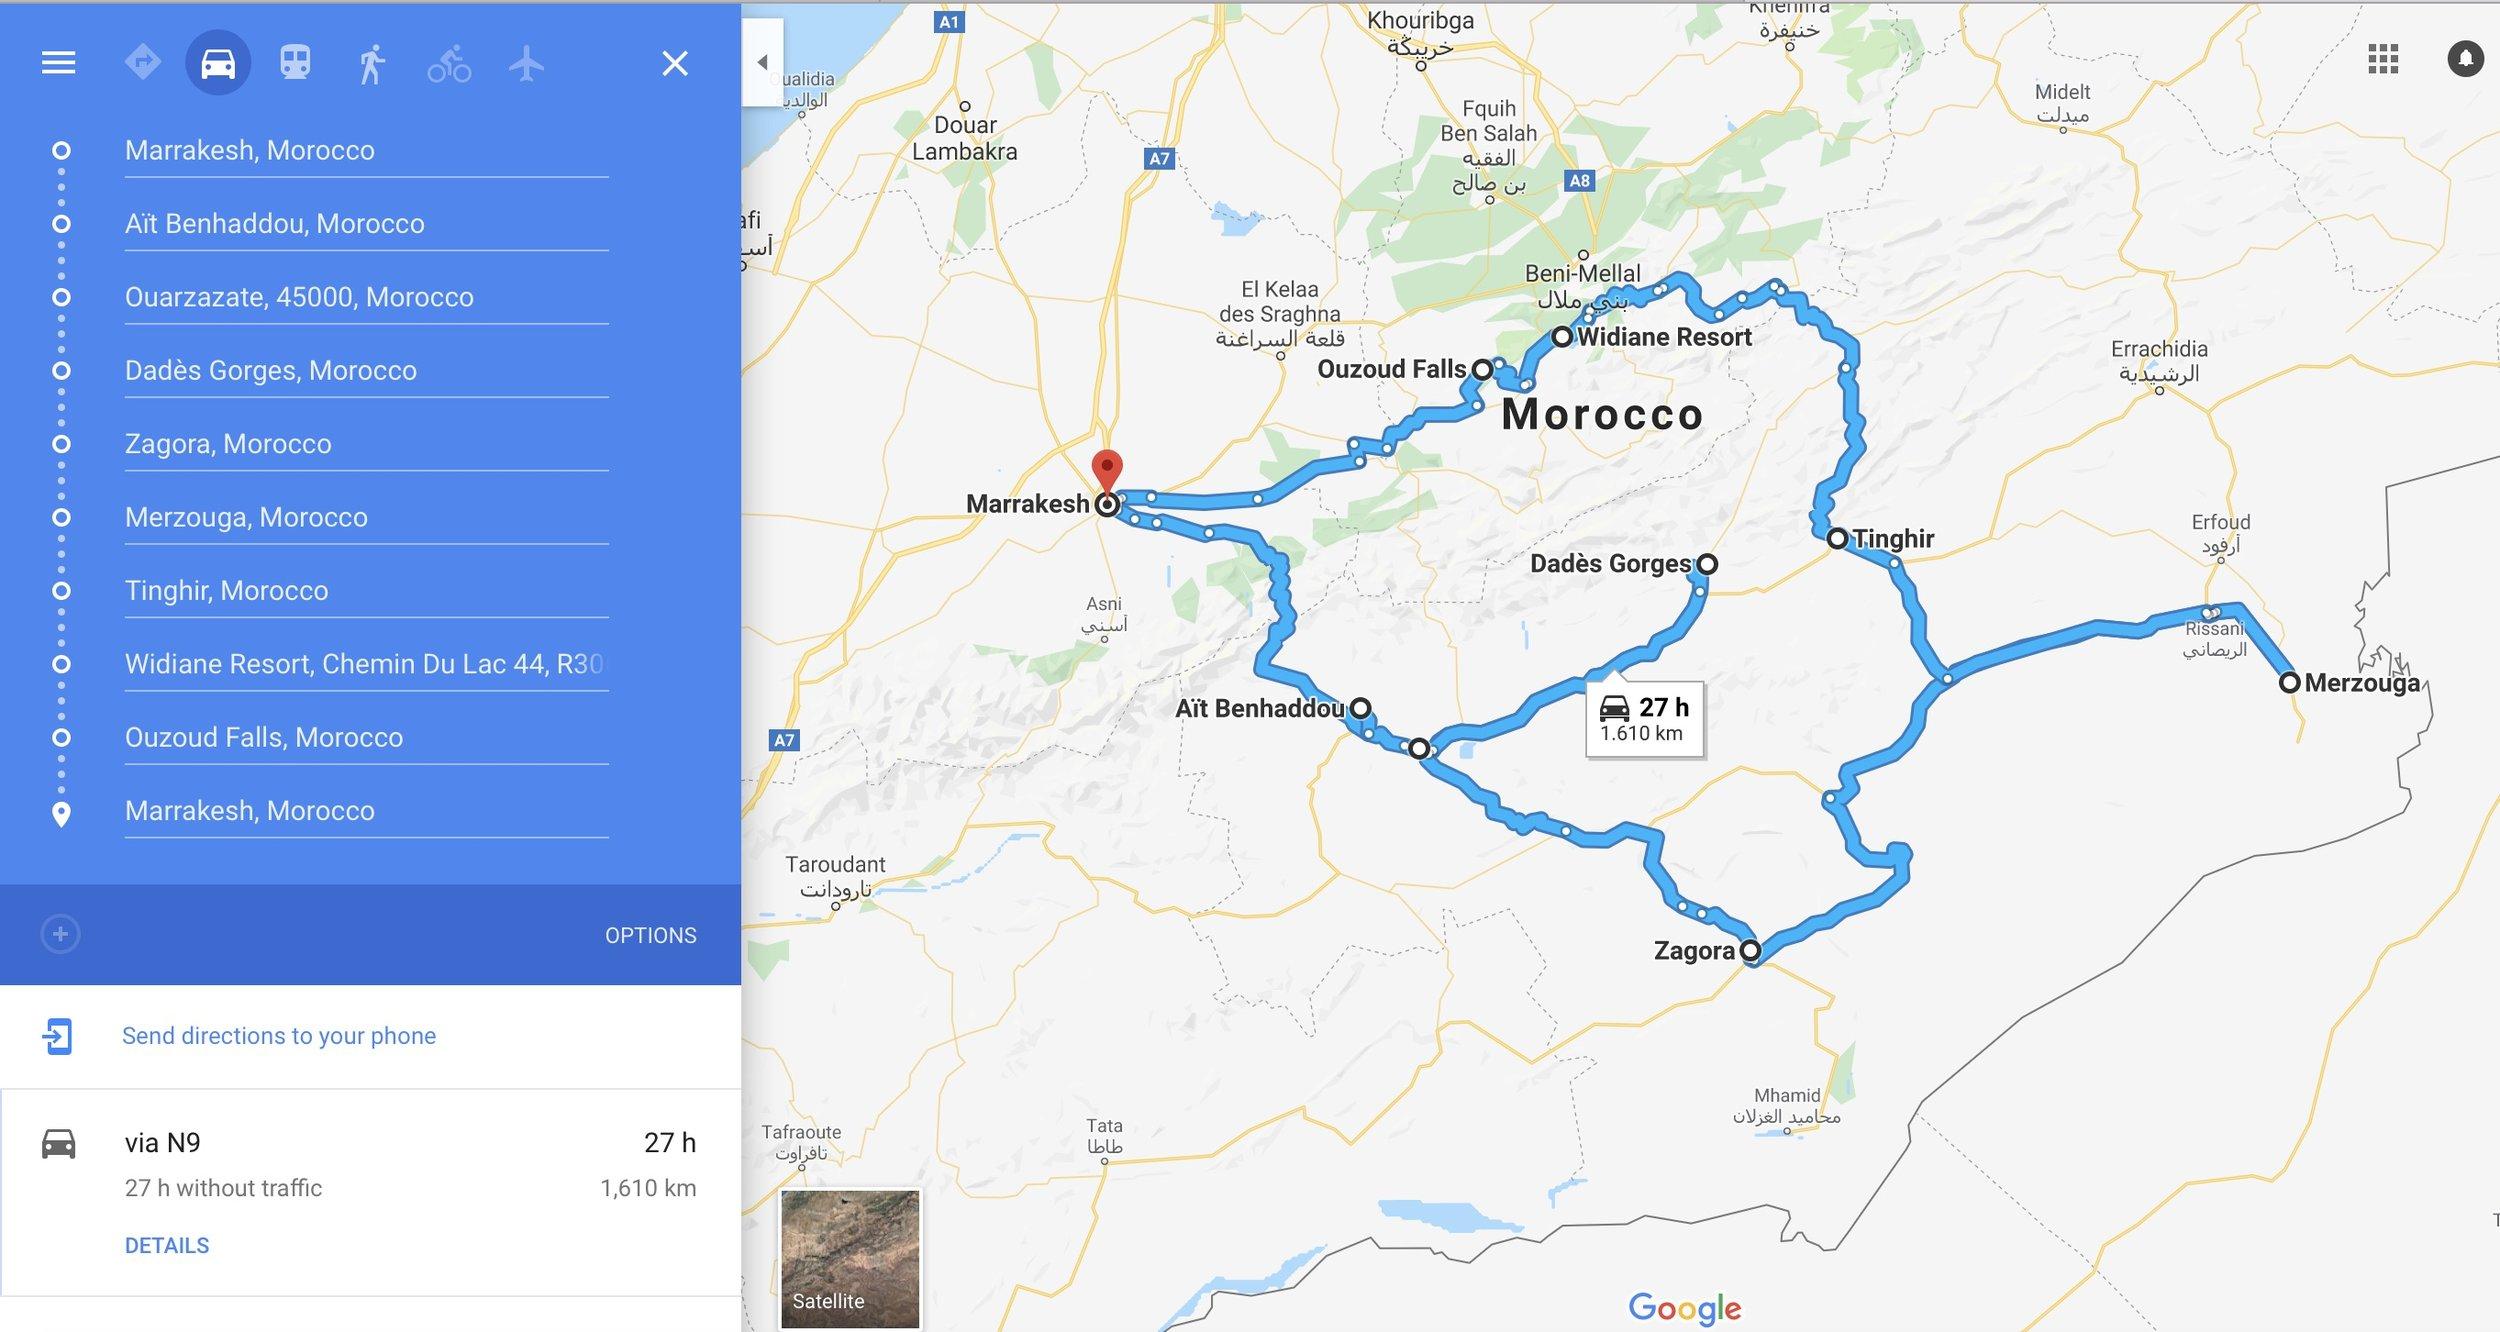 Morocco-road-trip.jpeg